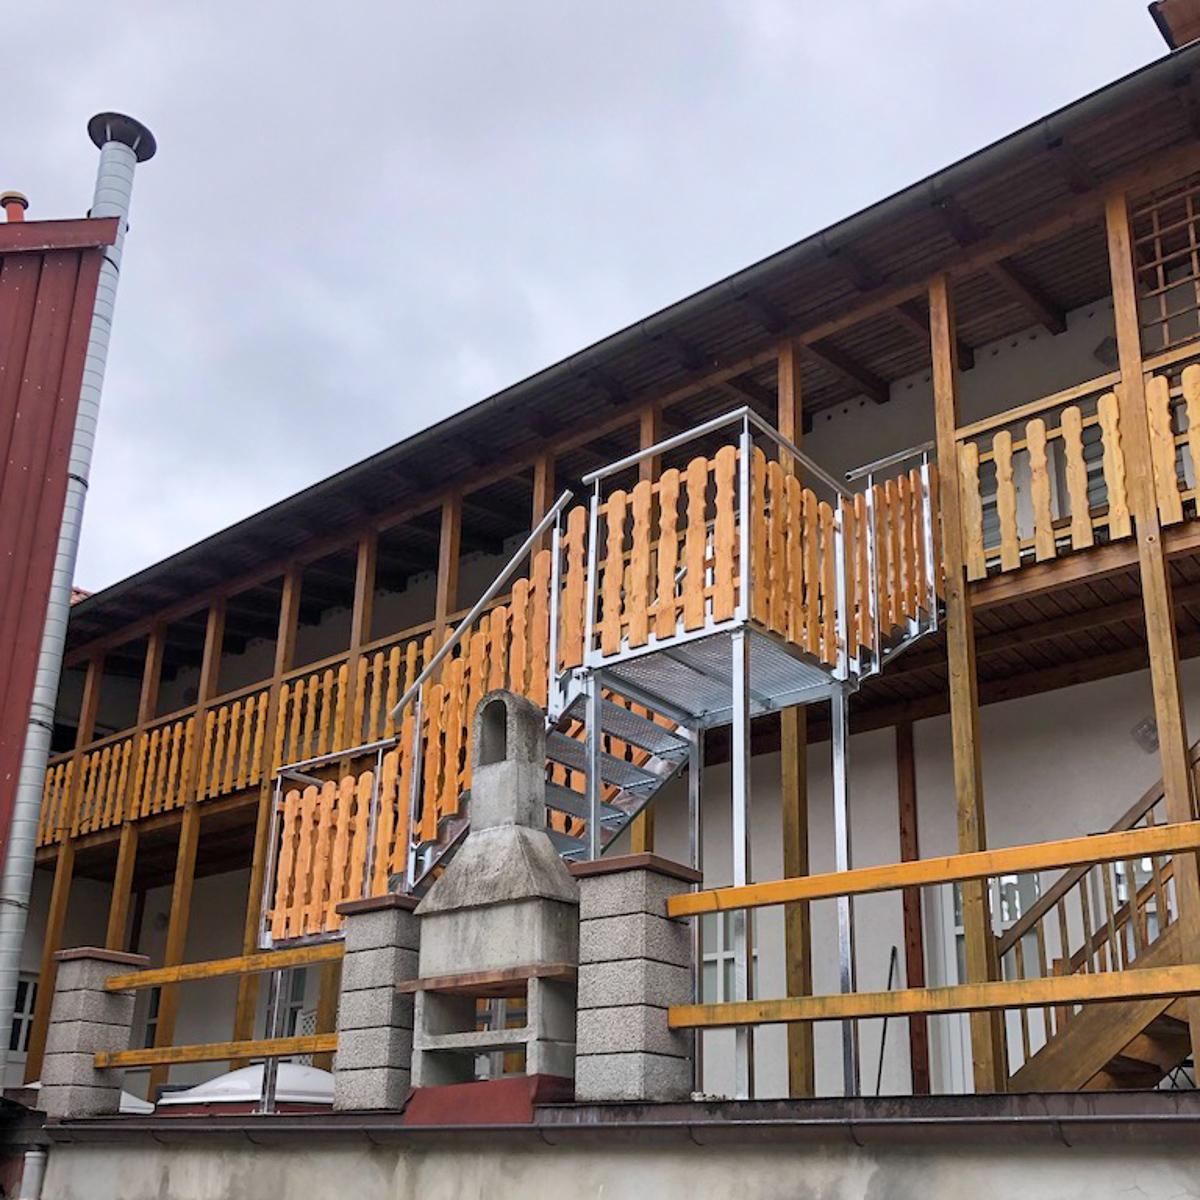 Metalltreppen Fluchttreppe Wangen verzinkter Stahl Gitterrostestufen Podeste Hochbretter Füllung Holztreppe